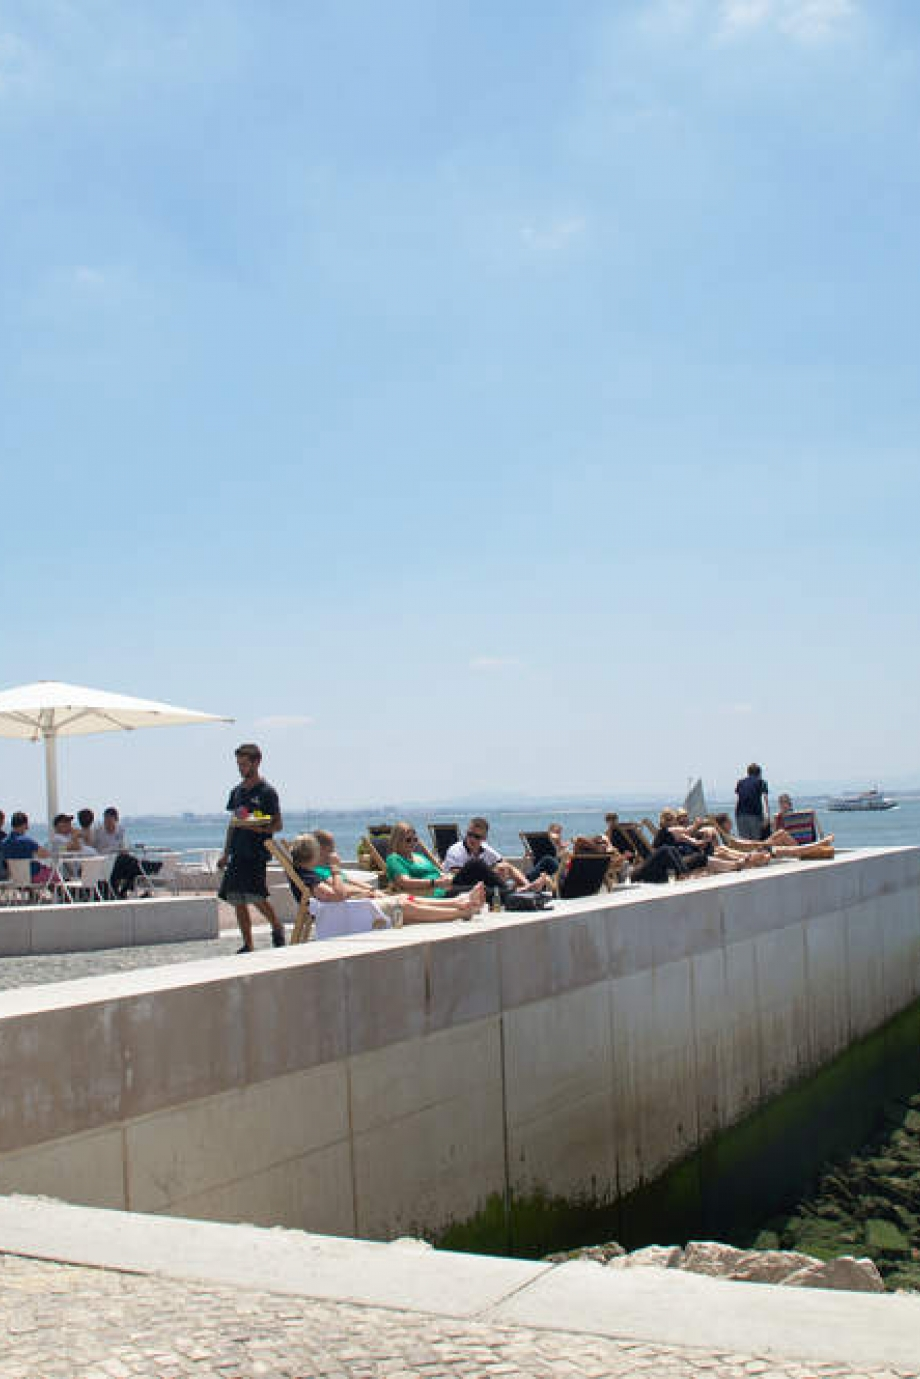 LisboaCool_Blog_Até Setembro, há festas na Ribeira das Naus